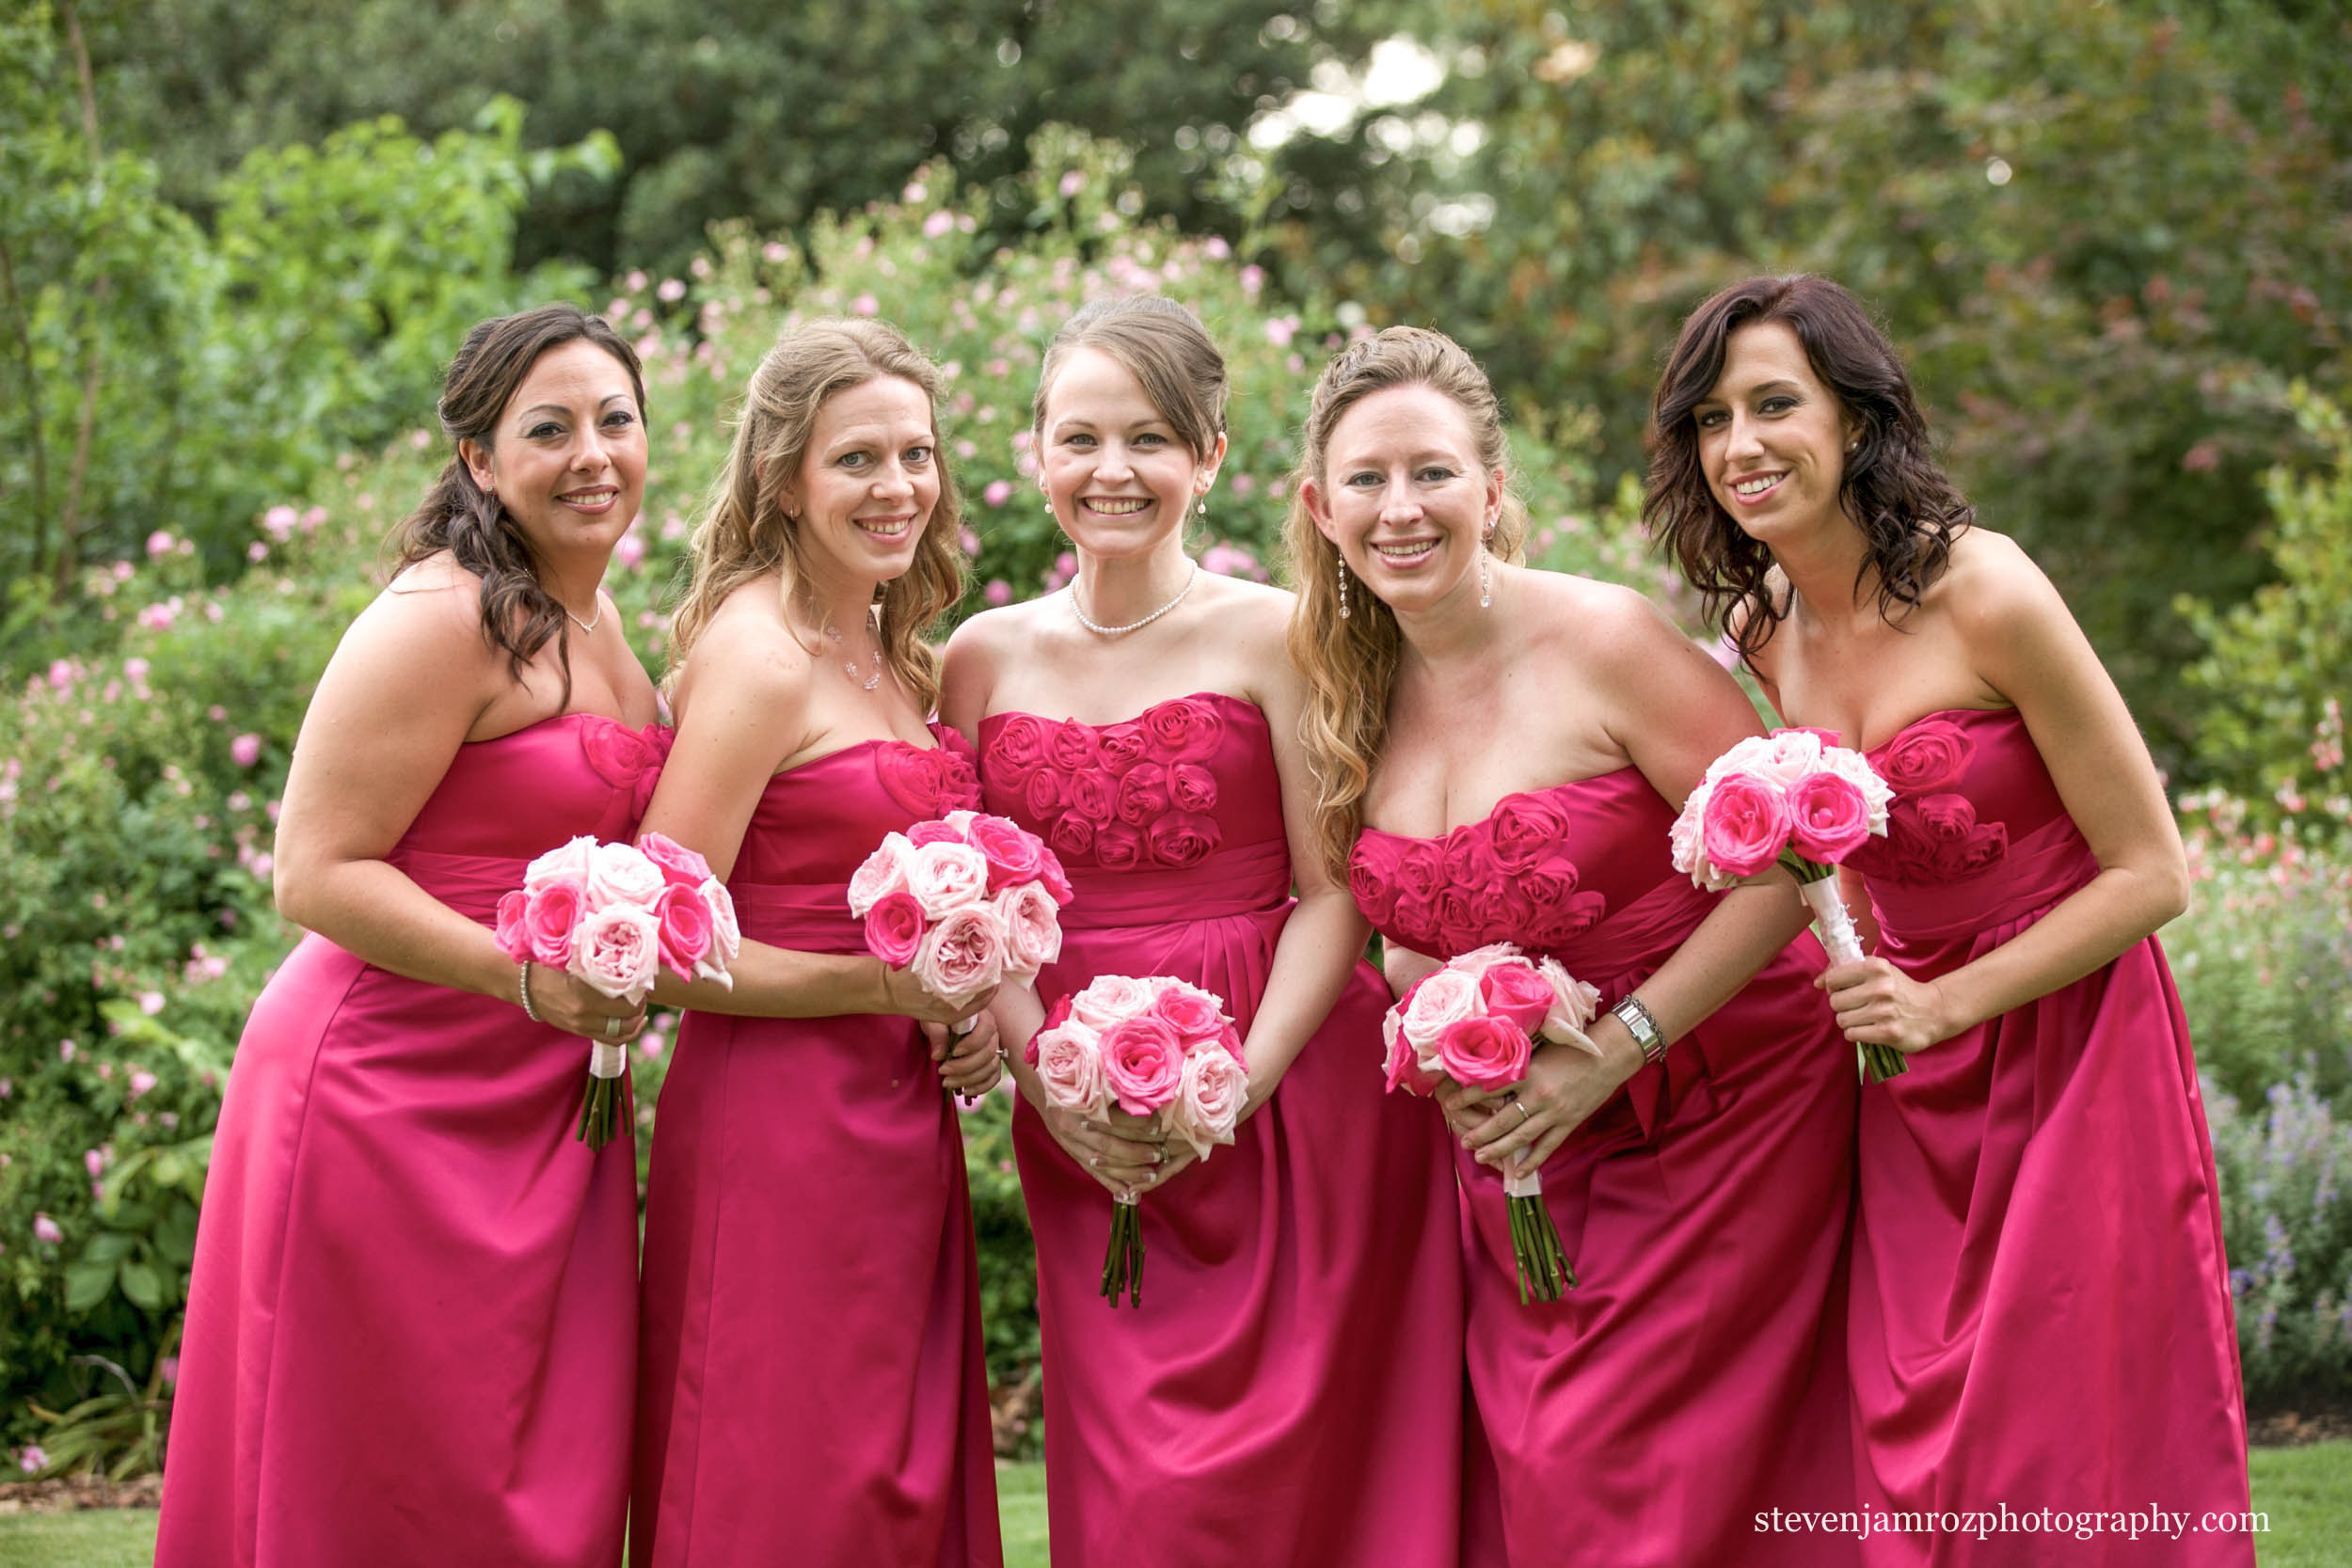 pink-bridesmaids-dresses-steven-jamroz-photography-0239.jpg